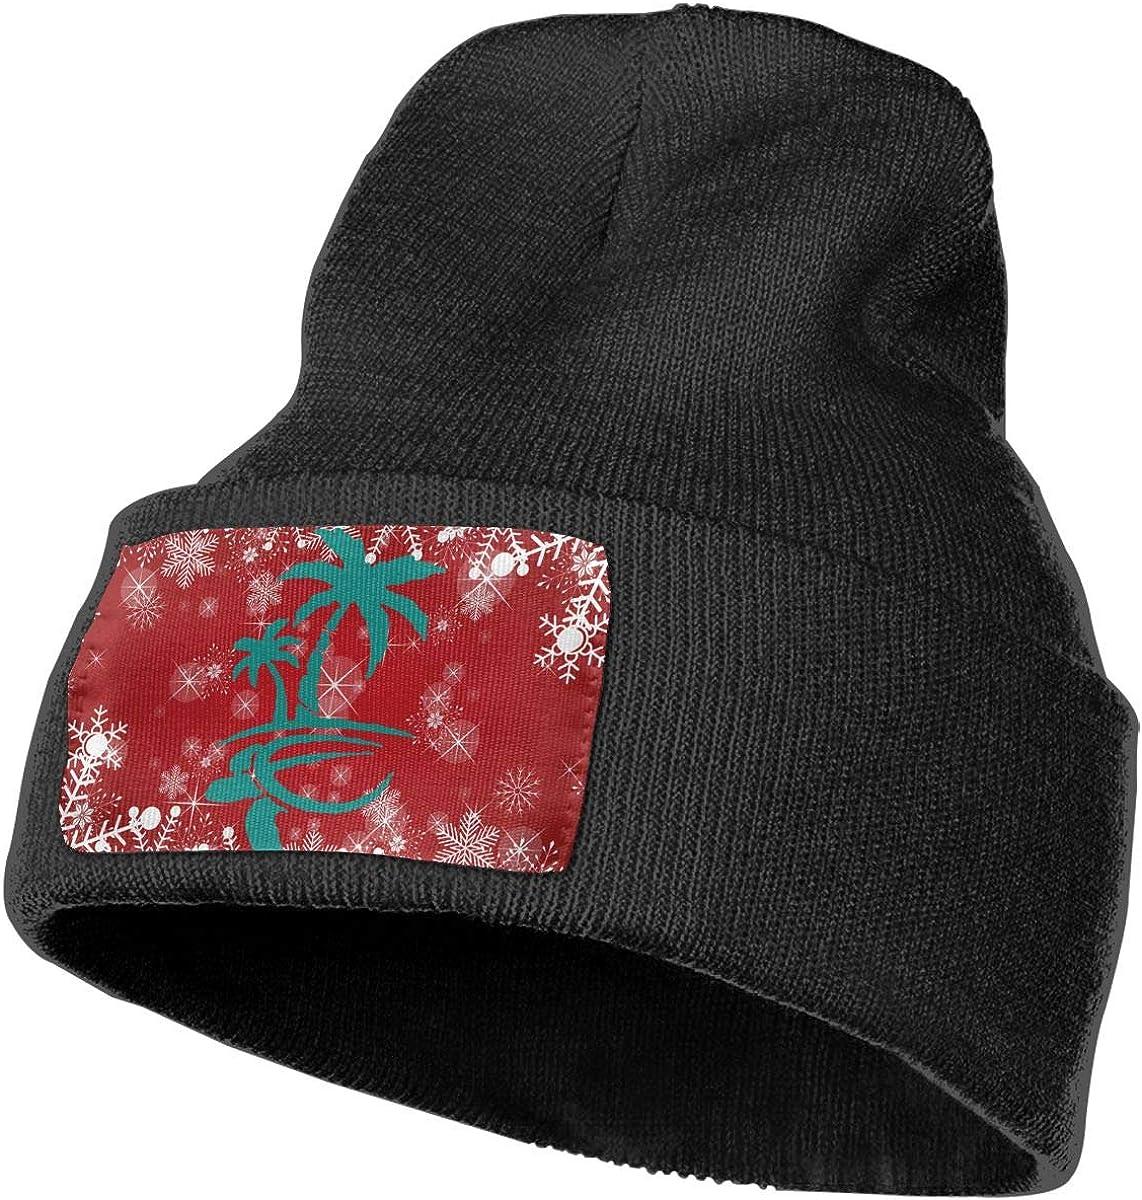 Hawaiian Palm Tree and Sea Turtle Men /& Women Knit Hats Stretchy /& Soft Beanie Cap Hat Beanie